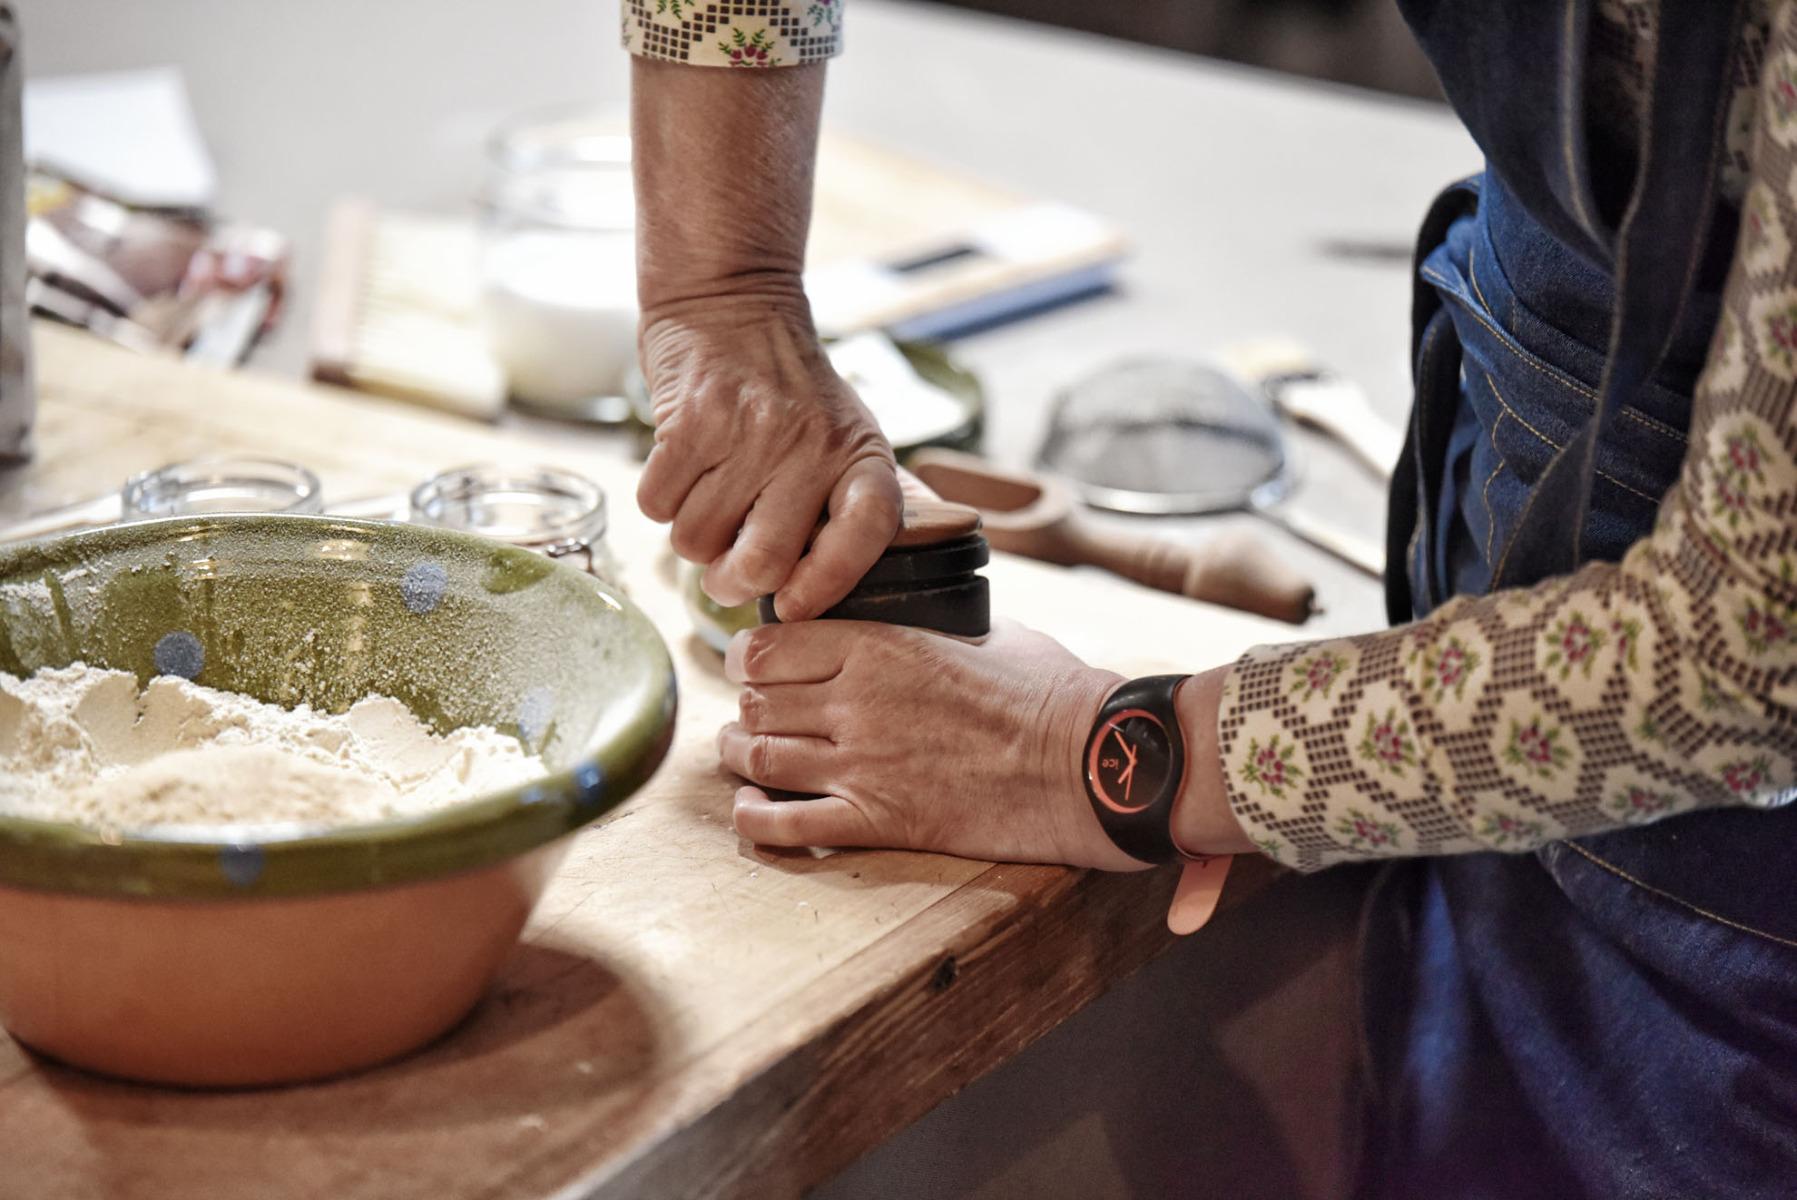 Zubereitung Koriander mahlen